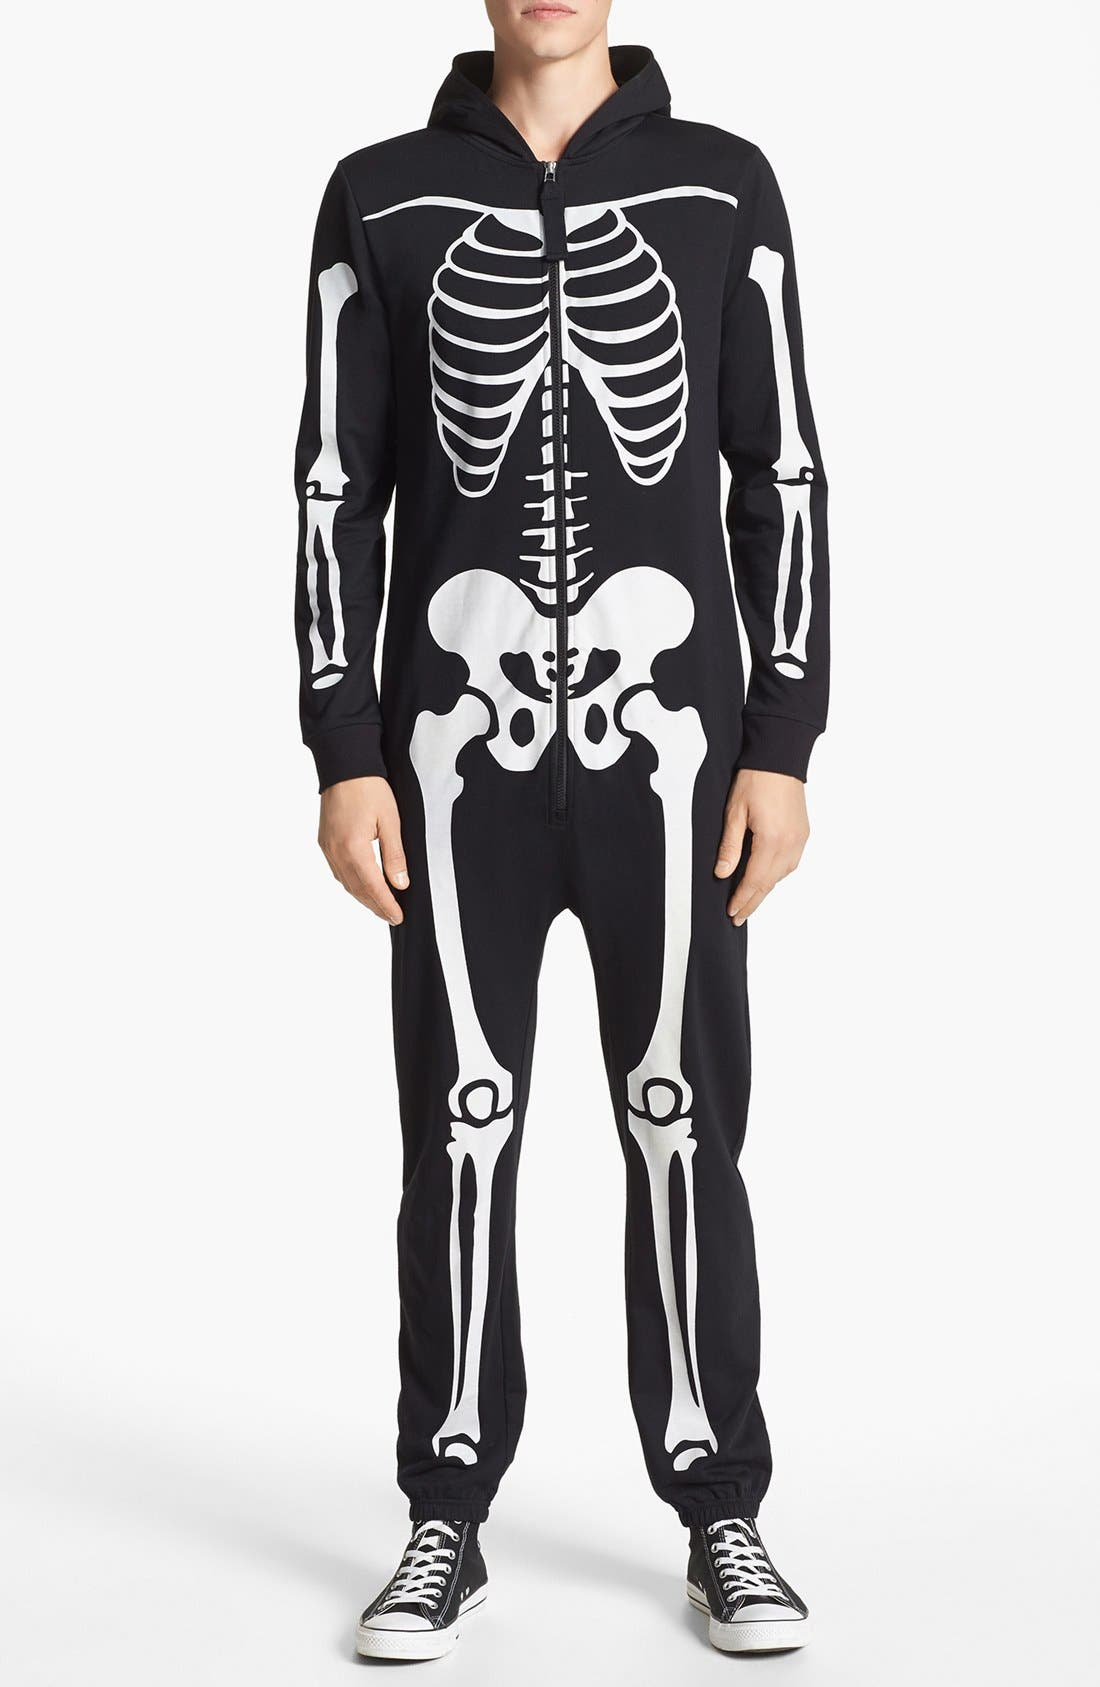 TOPMAN Glow In The Dark Skeleton Print Bodysuit, Main, color, 001